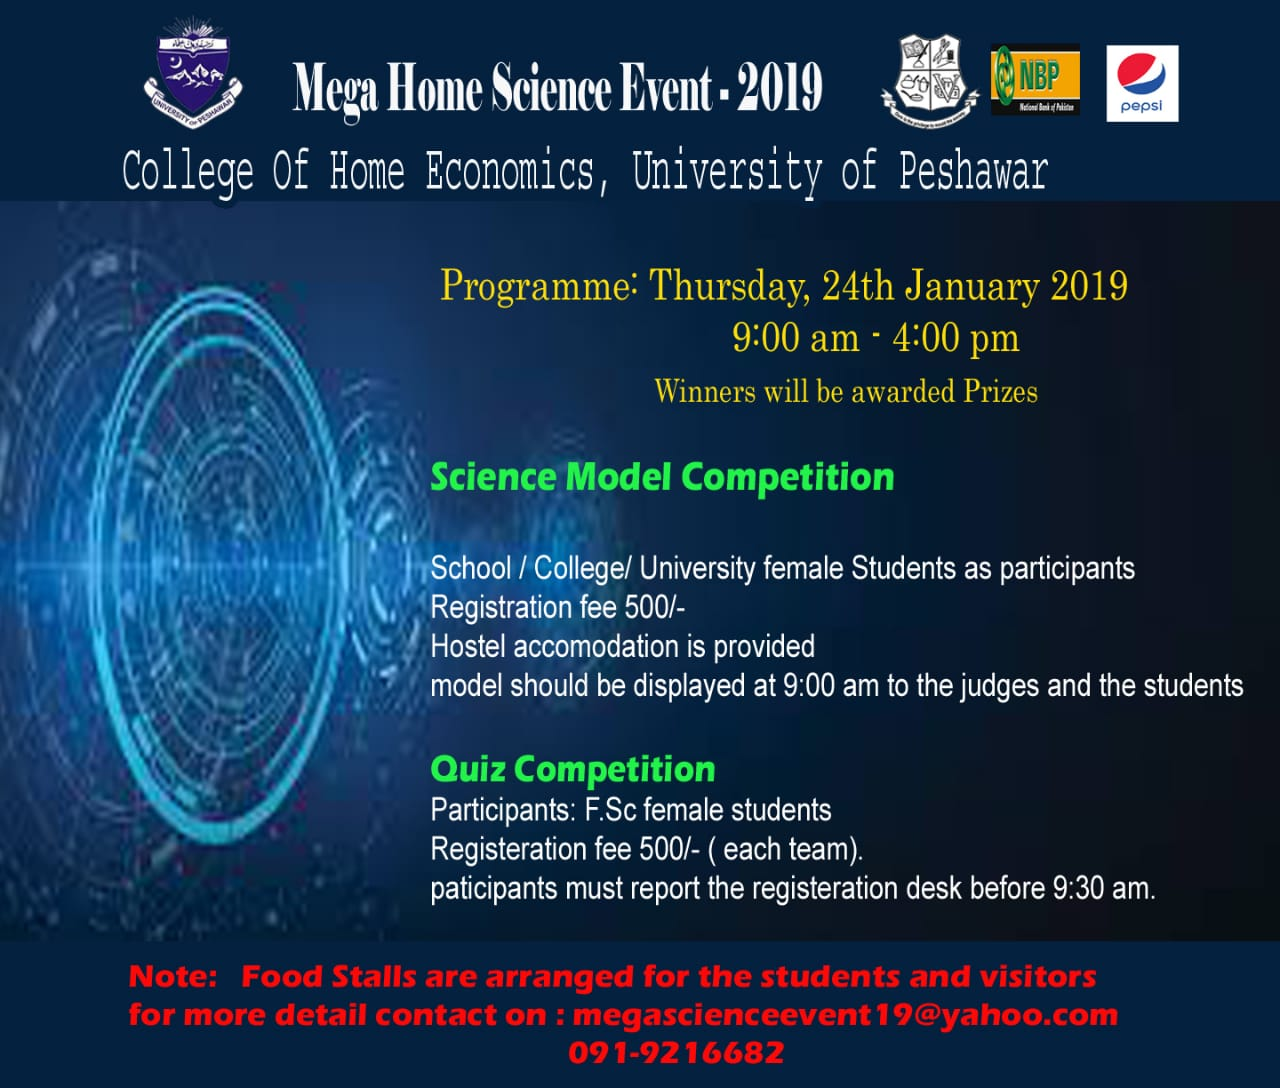 Mega Home Science Event 2019